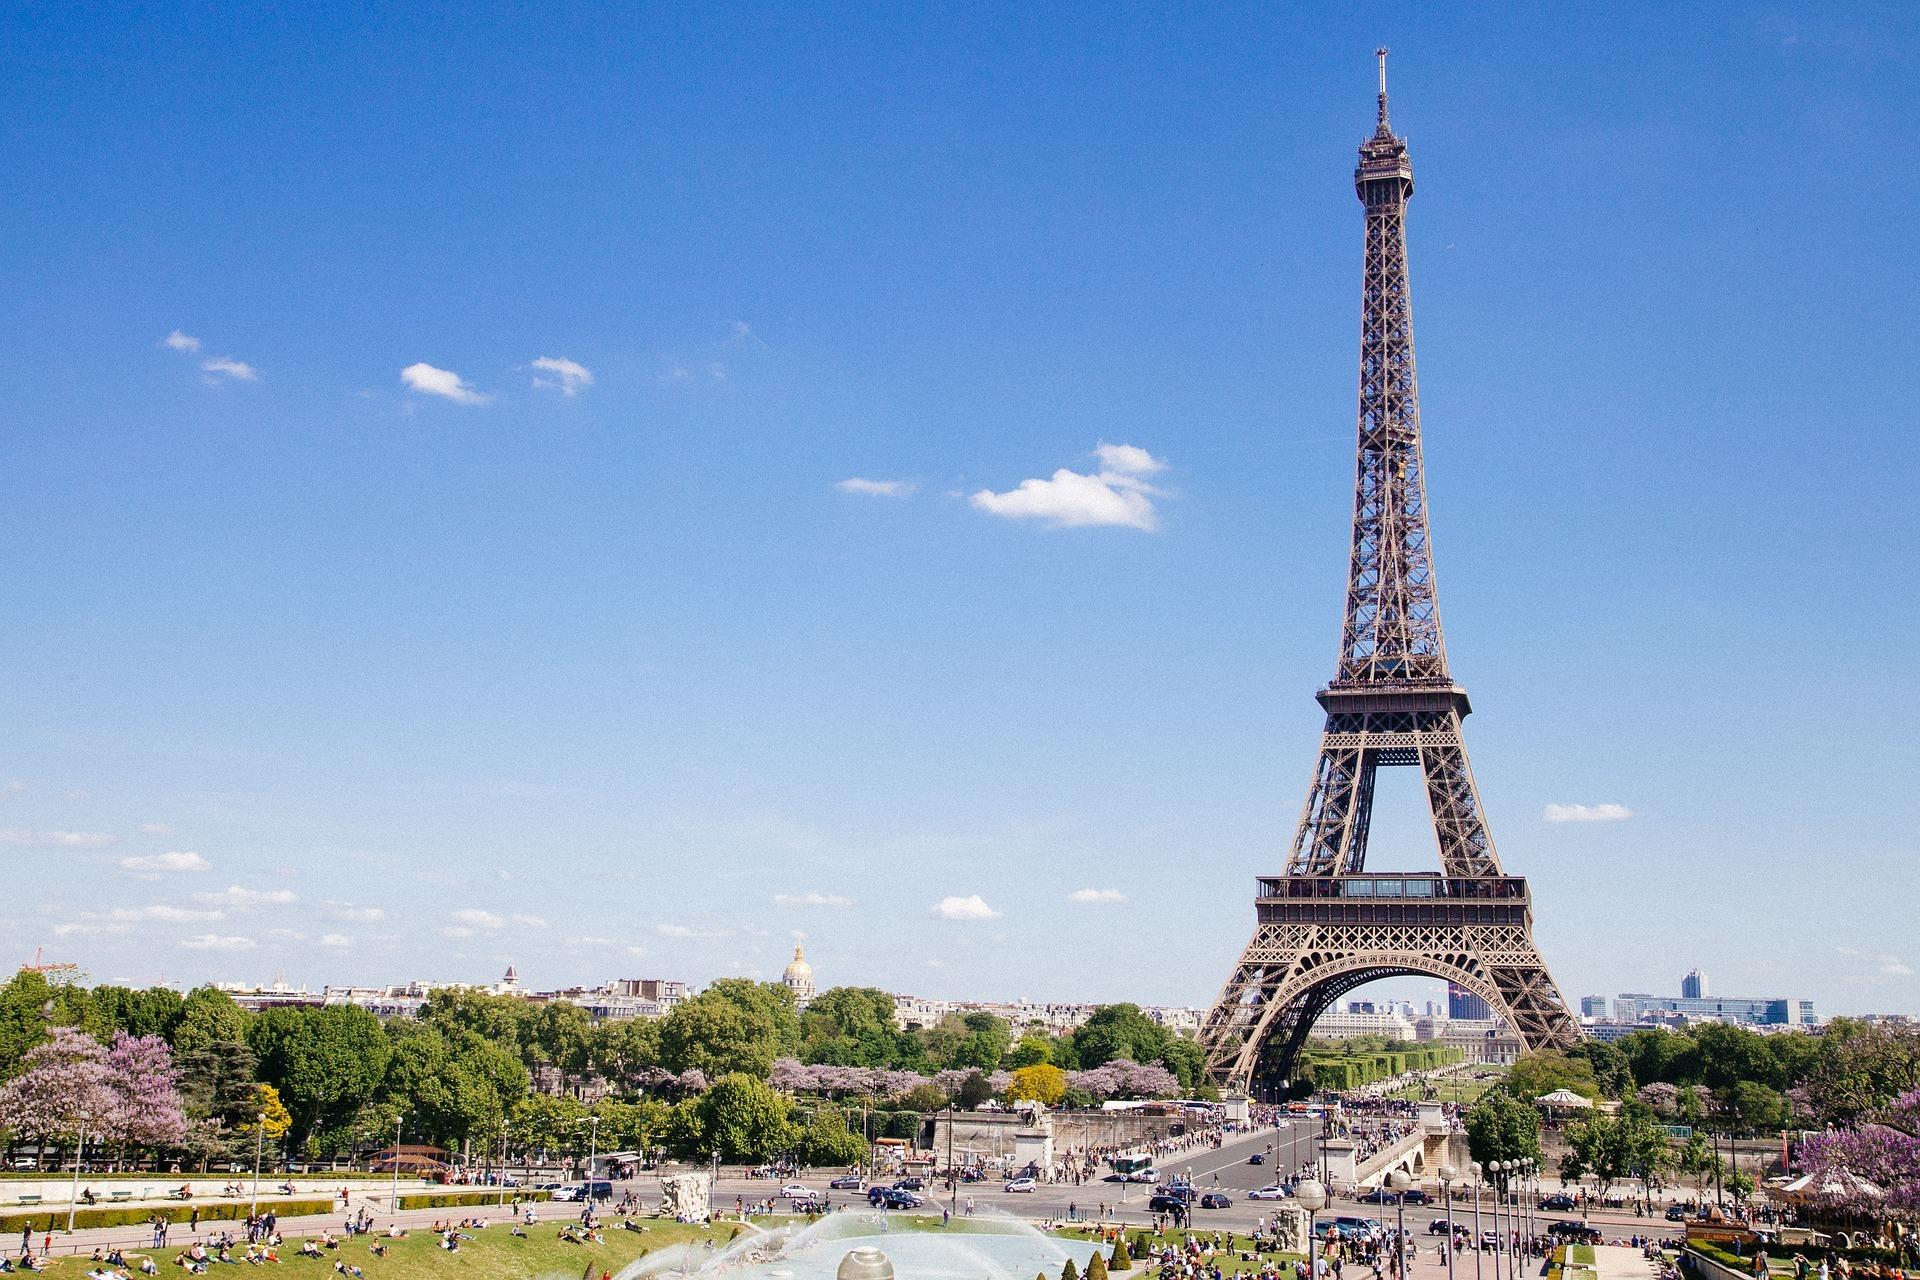 eiffel tower_eiffelturm_tower_eiffel_turm_paris_frankreich_sehenswürdigkeit